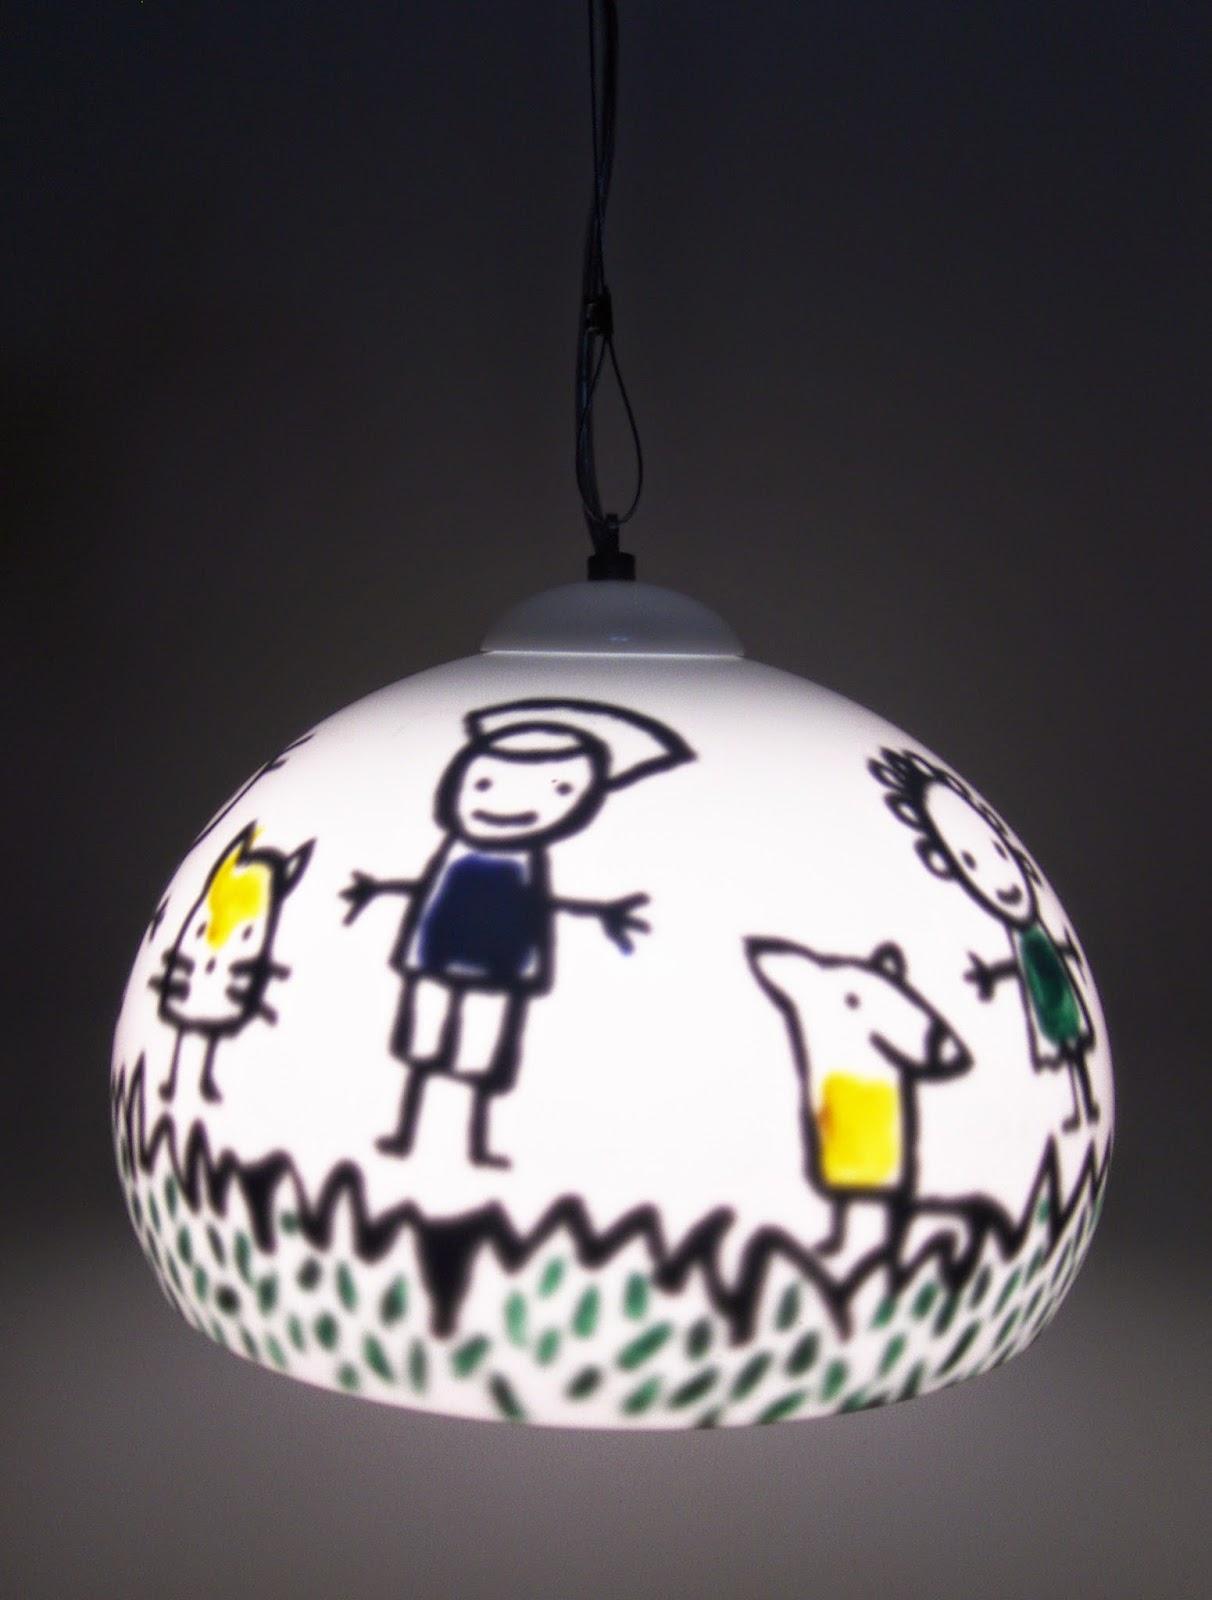 Ludica iluminacion lamparas de acrilico de techo colgantes - Lamparas infantiles colgantes ...